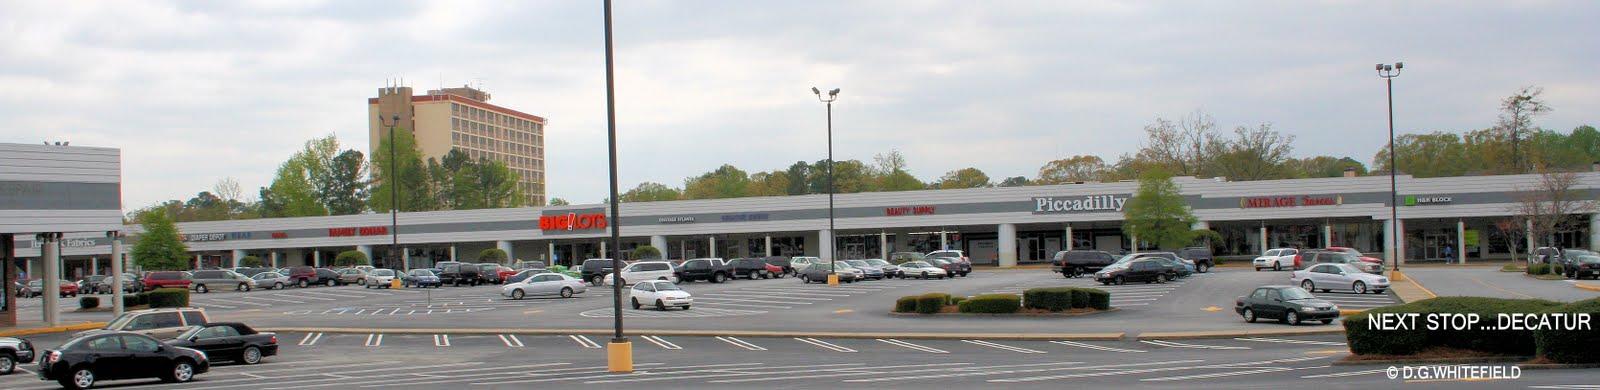 NEXT STOP...DECATUR: Next Stop for Walmart...Suburban Plaza